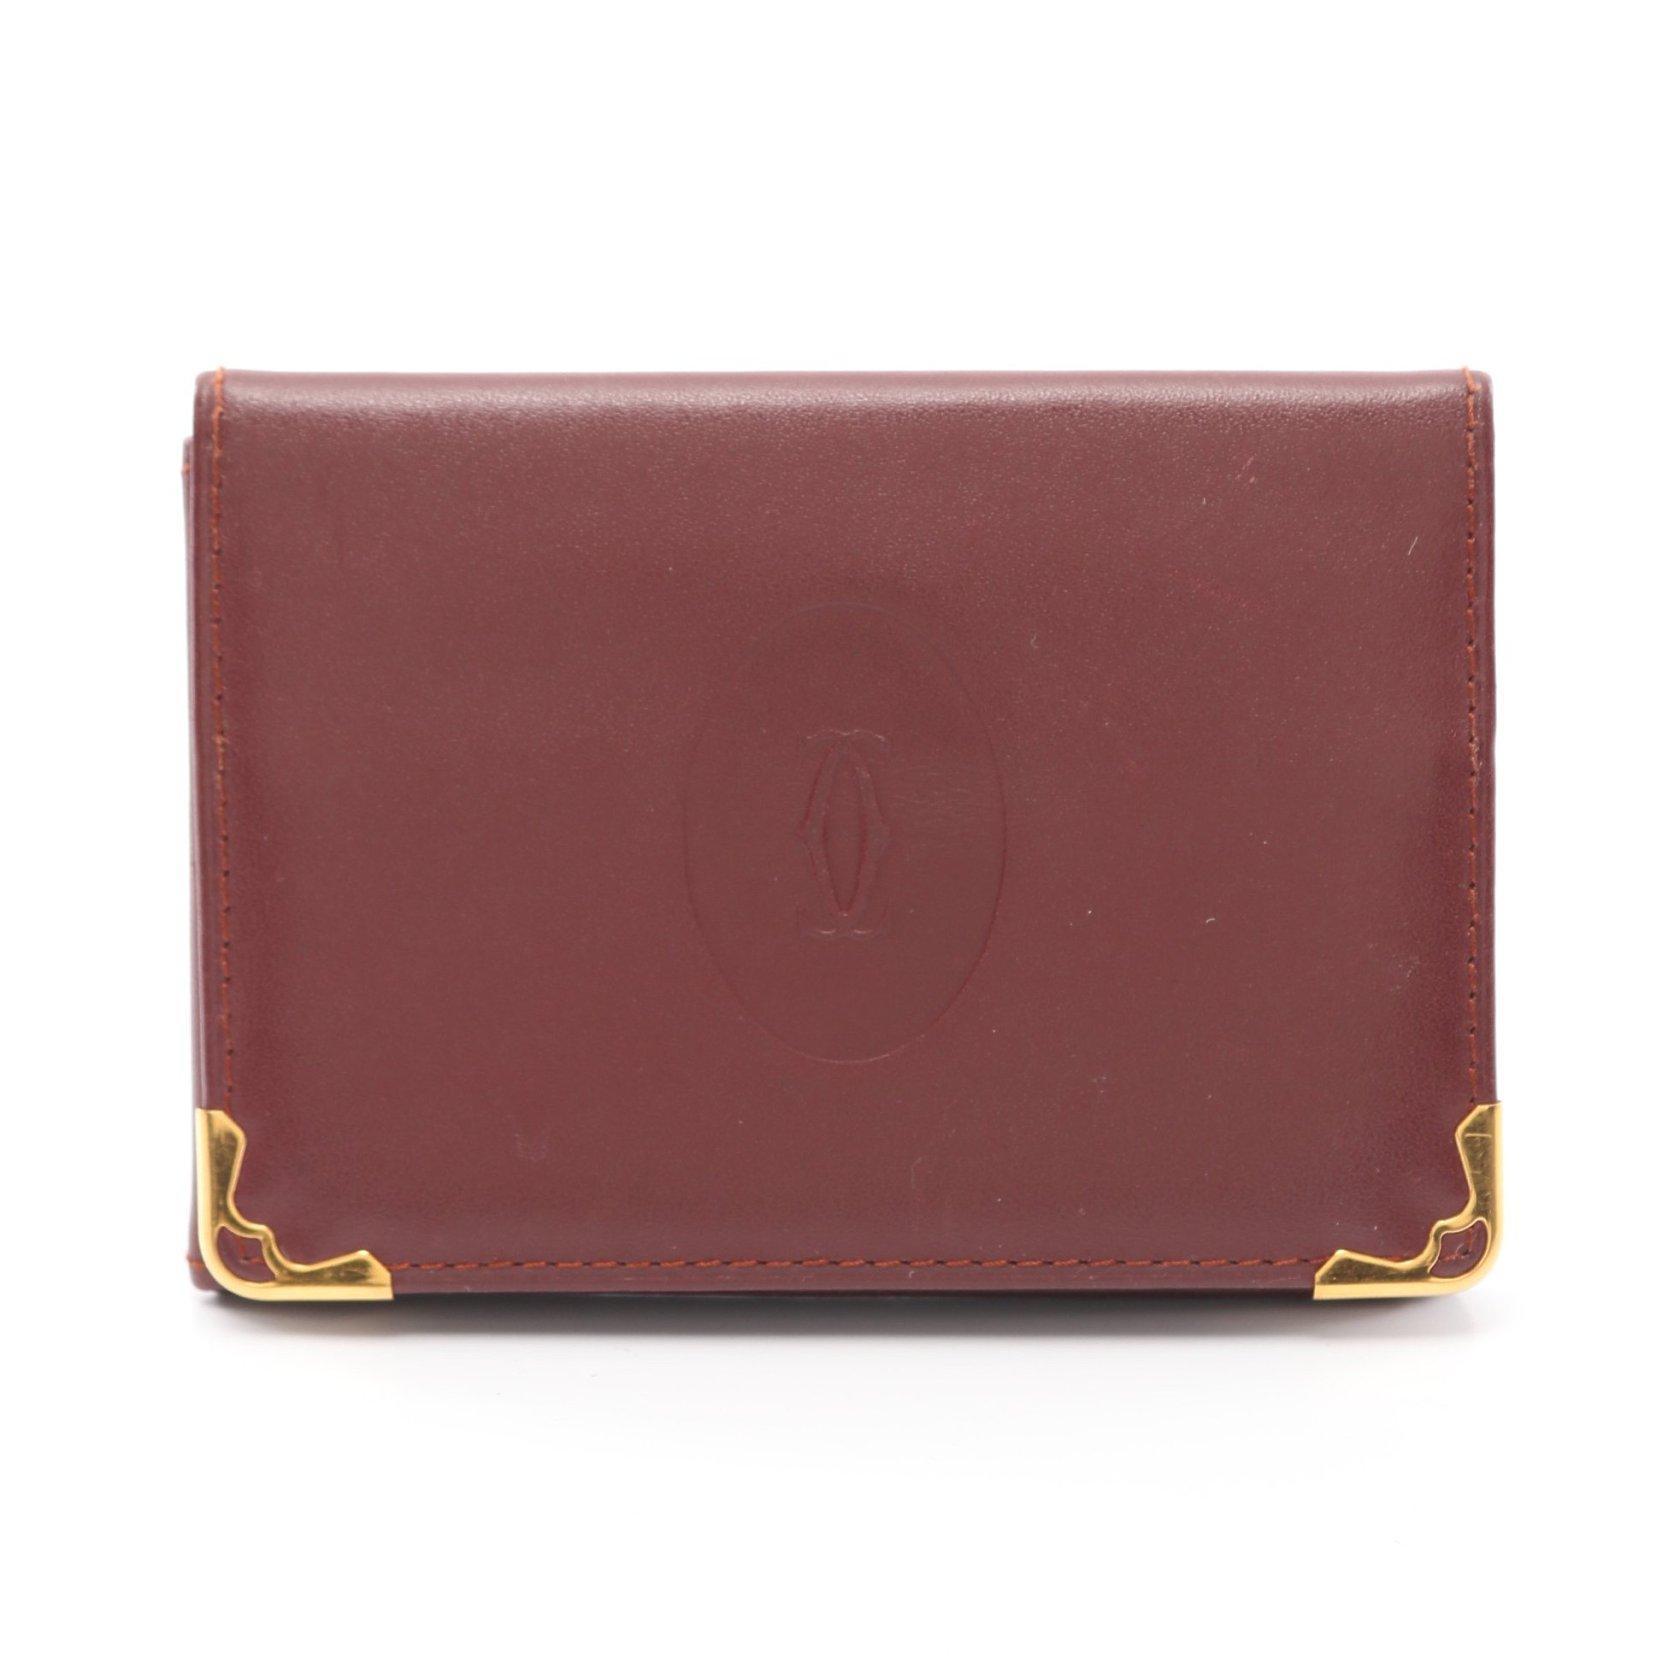 Cartier・財布・小物・マストライン カードケース パスケース レザー ボルドー